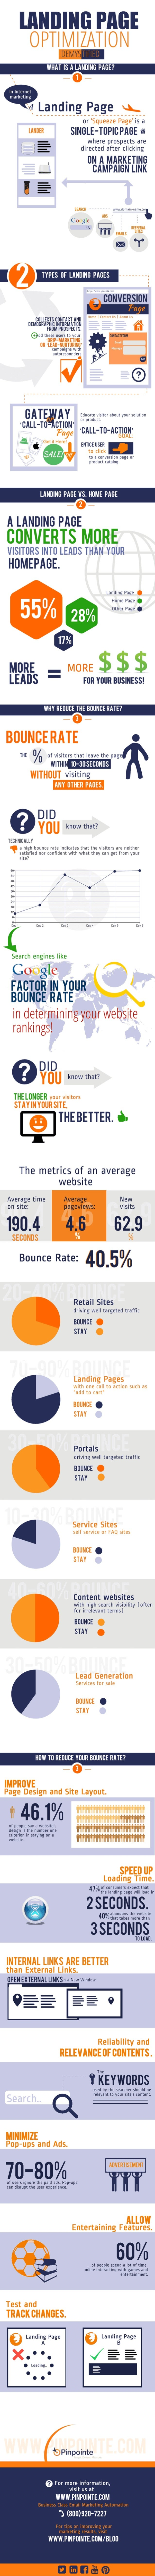 Infographic: Landing Page Optimization Demystified